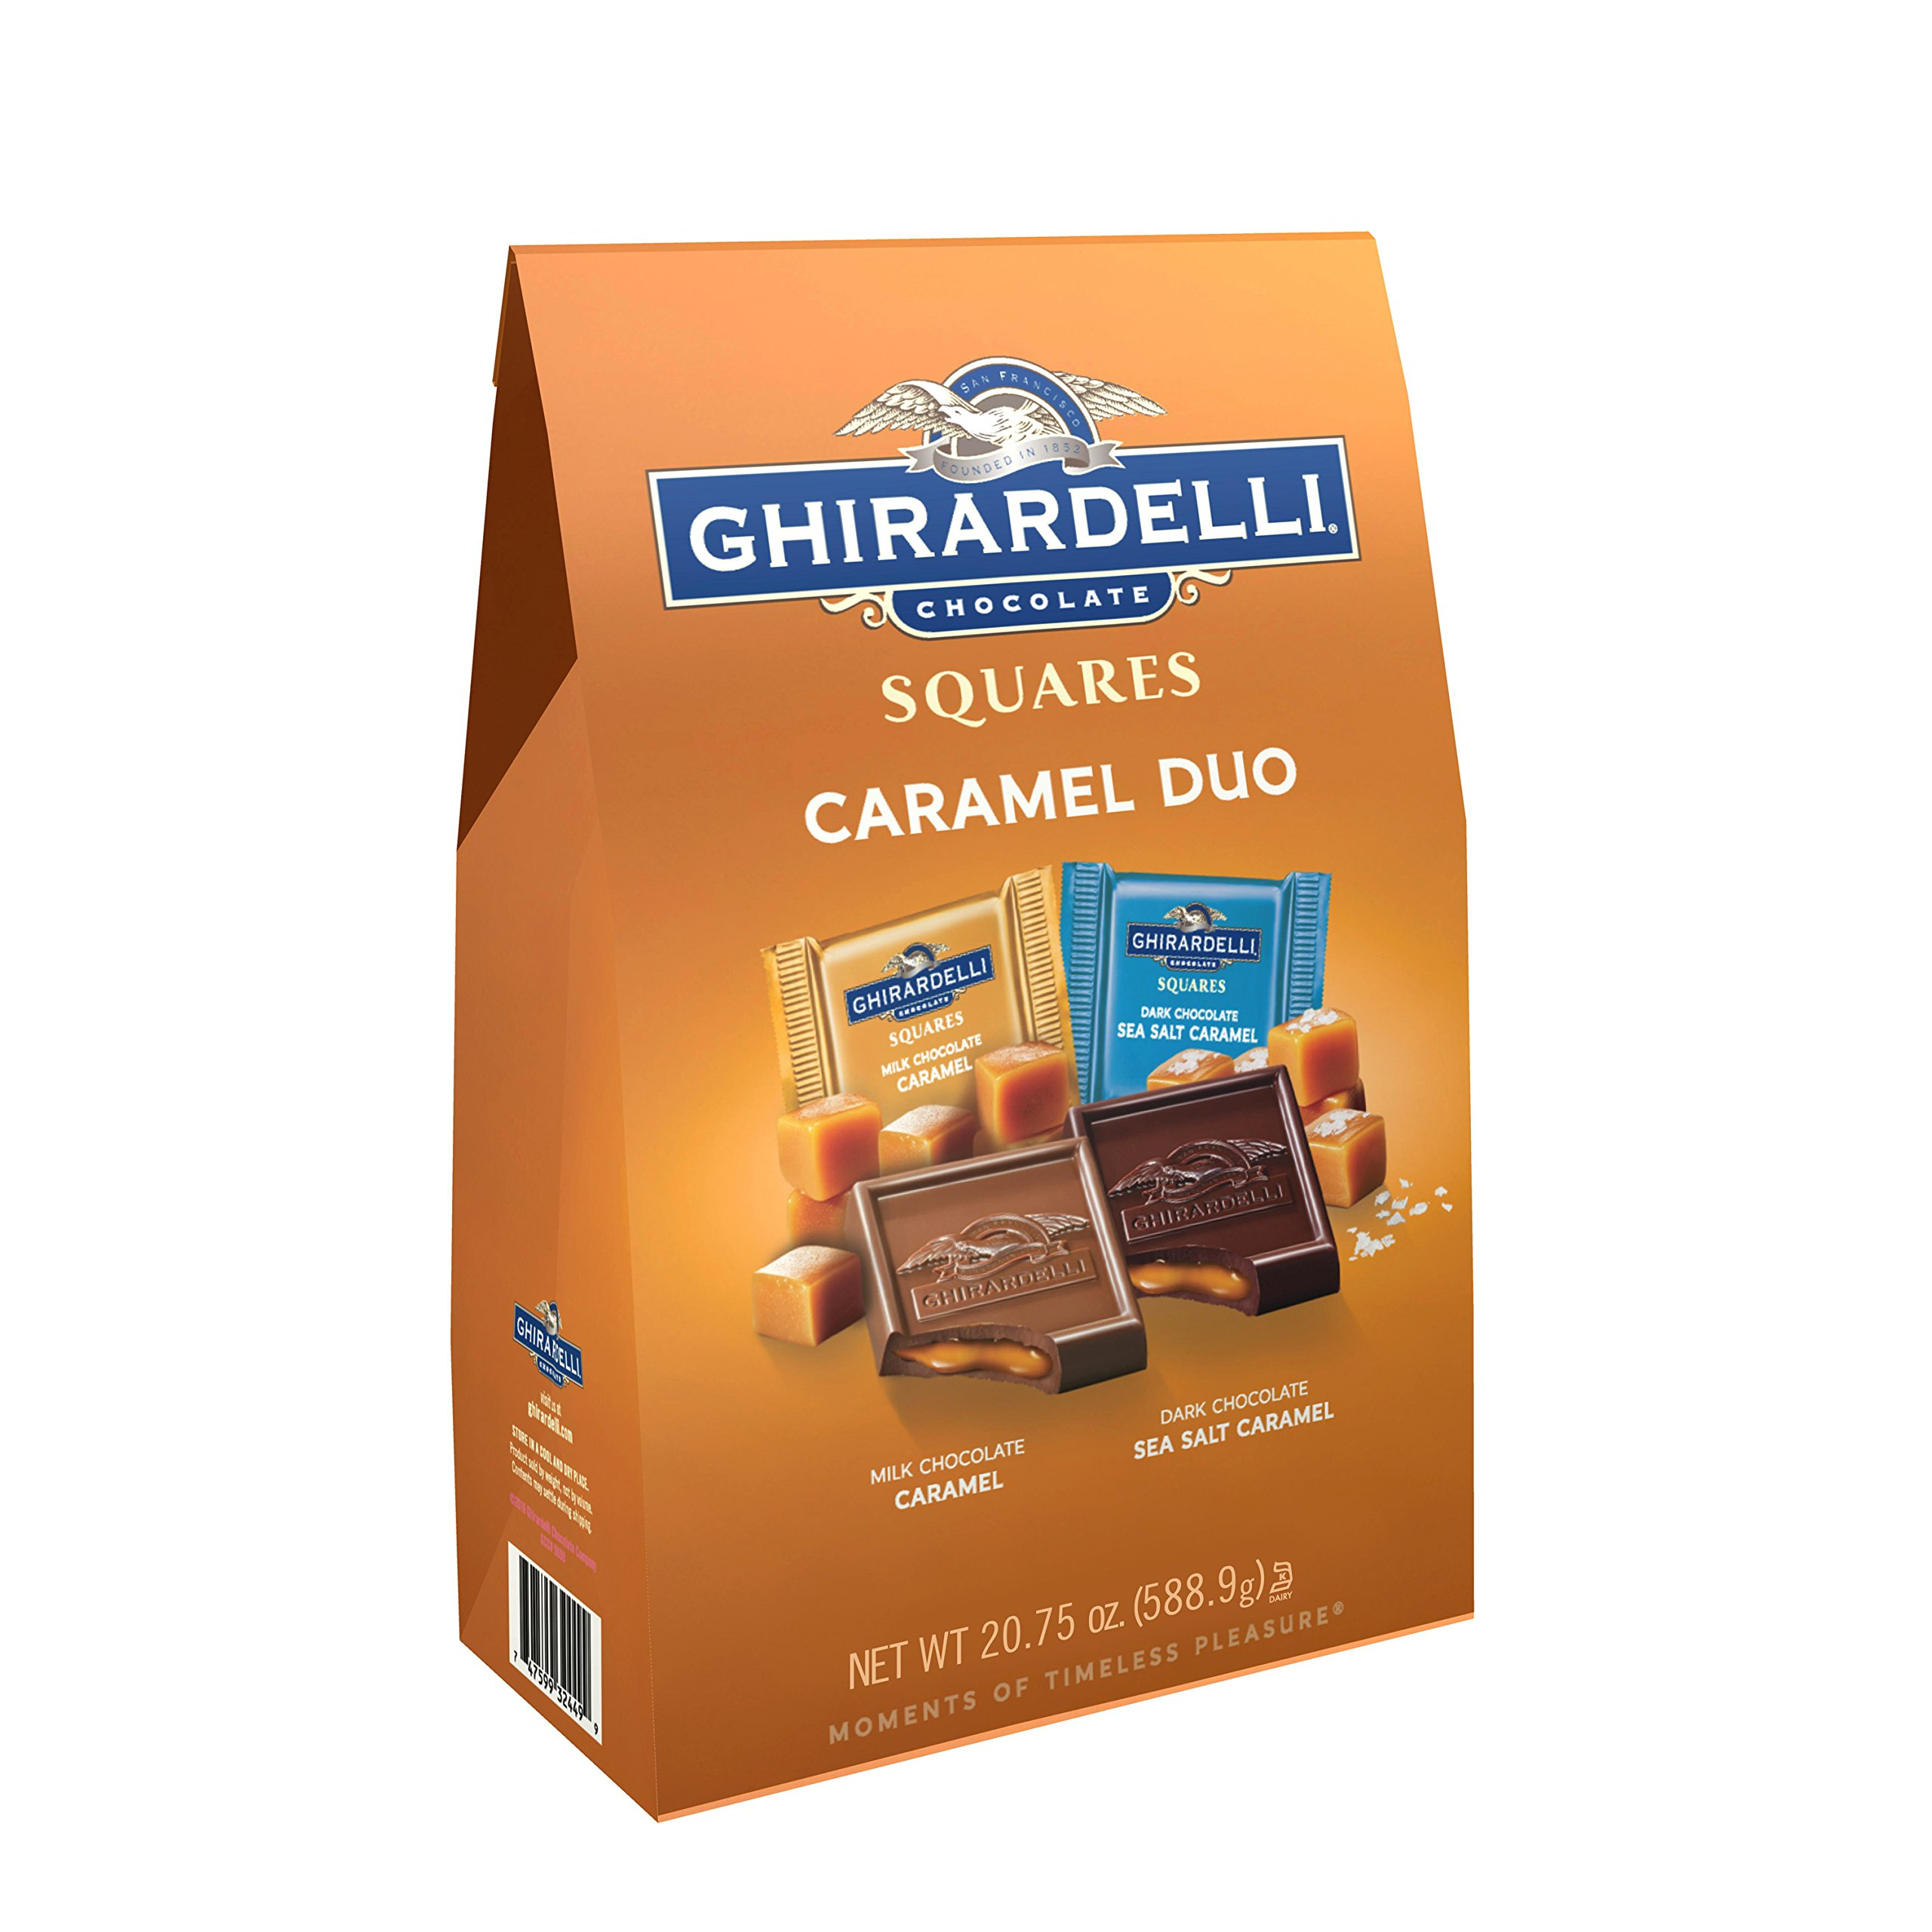 Ghirardelli Milk & Caramel Chocolate Squares, 27.5 Oz.,, 20.75 Oz () by Ghirardelli